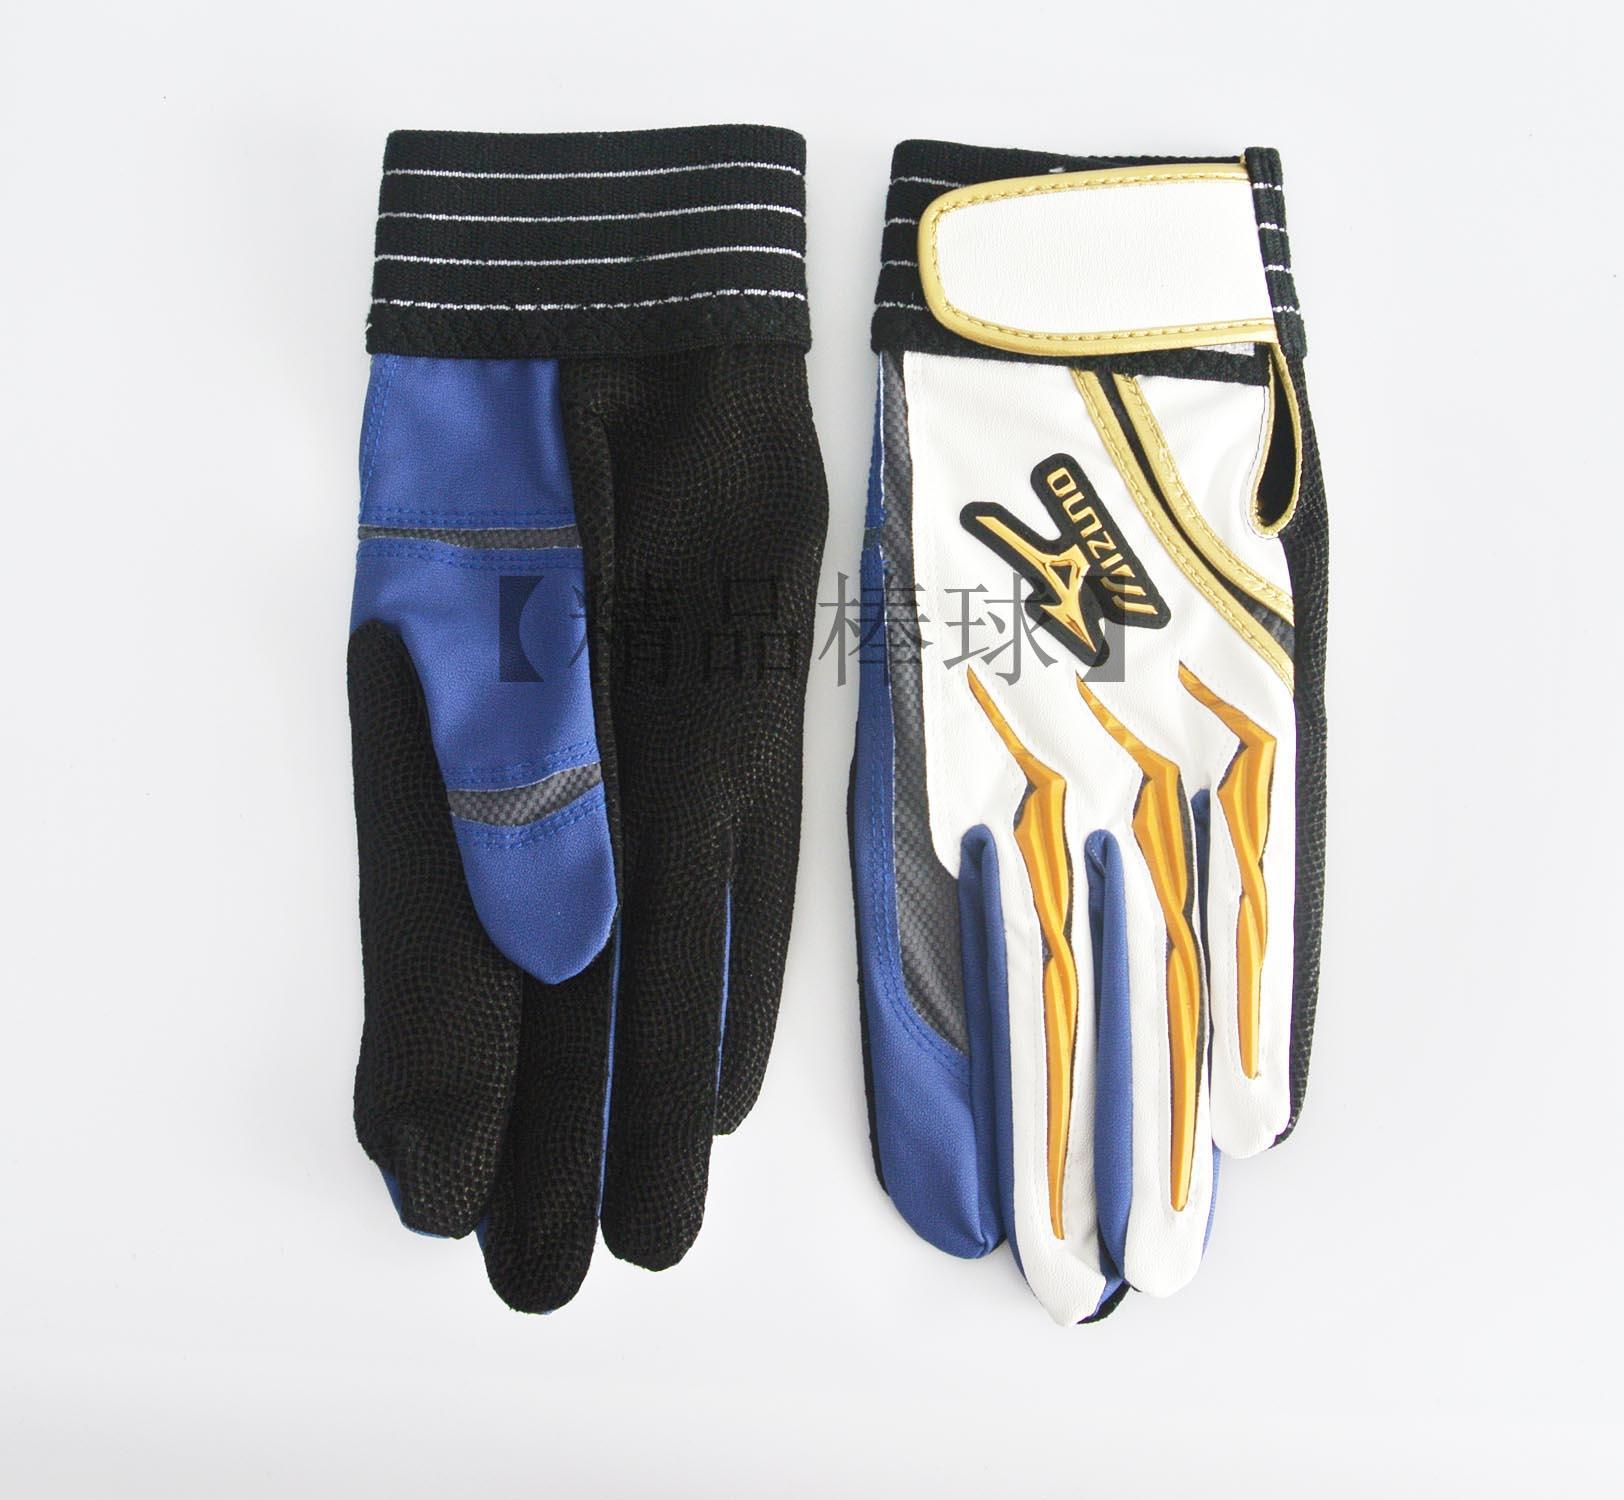 【Бутик-бейсбол】Япония Мизуно Мидзуно бейсбол и софтбол овчина удар перчатки (пара)